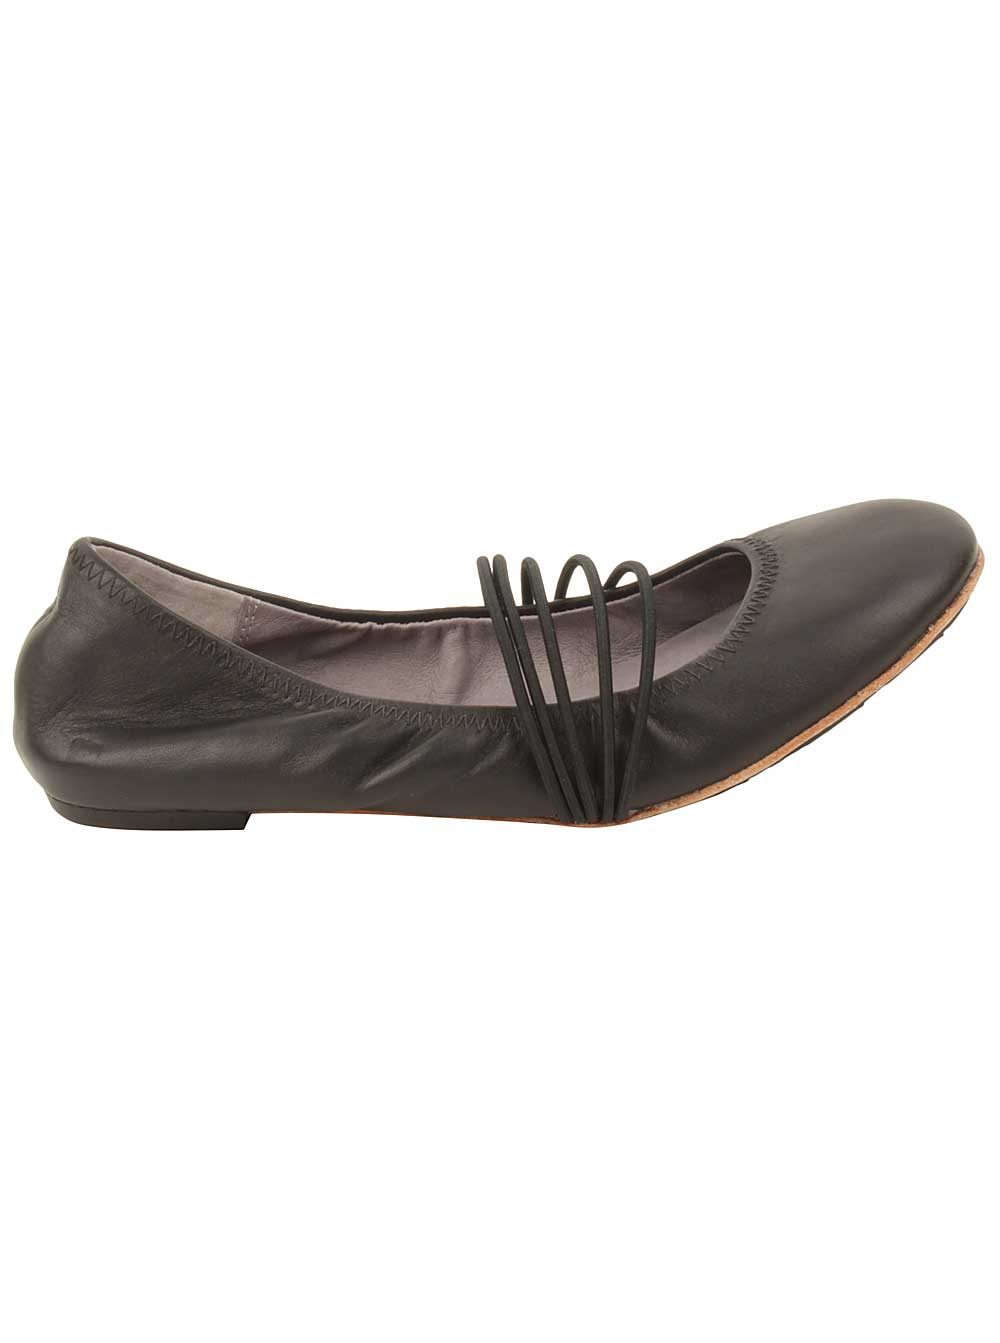 Tsubo Honnor Ballet Flats in Black 7 US